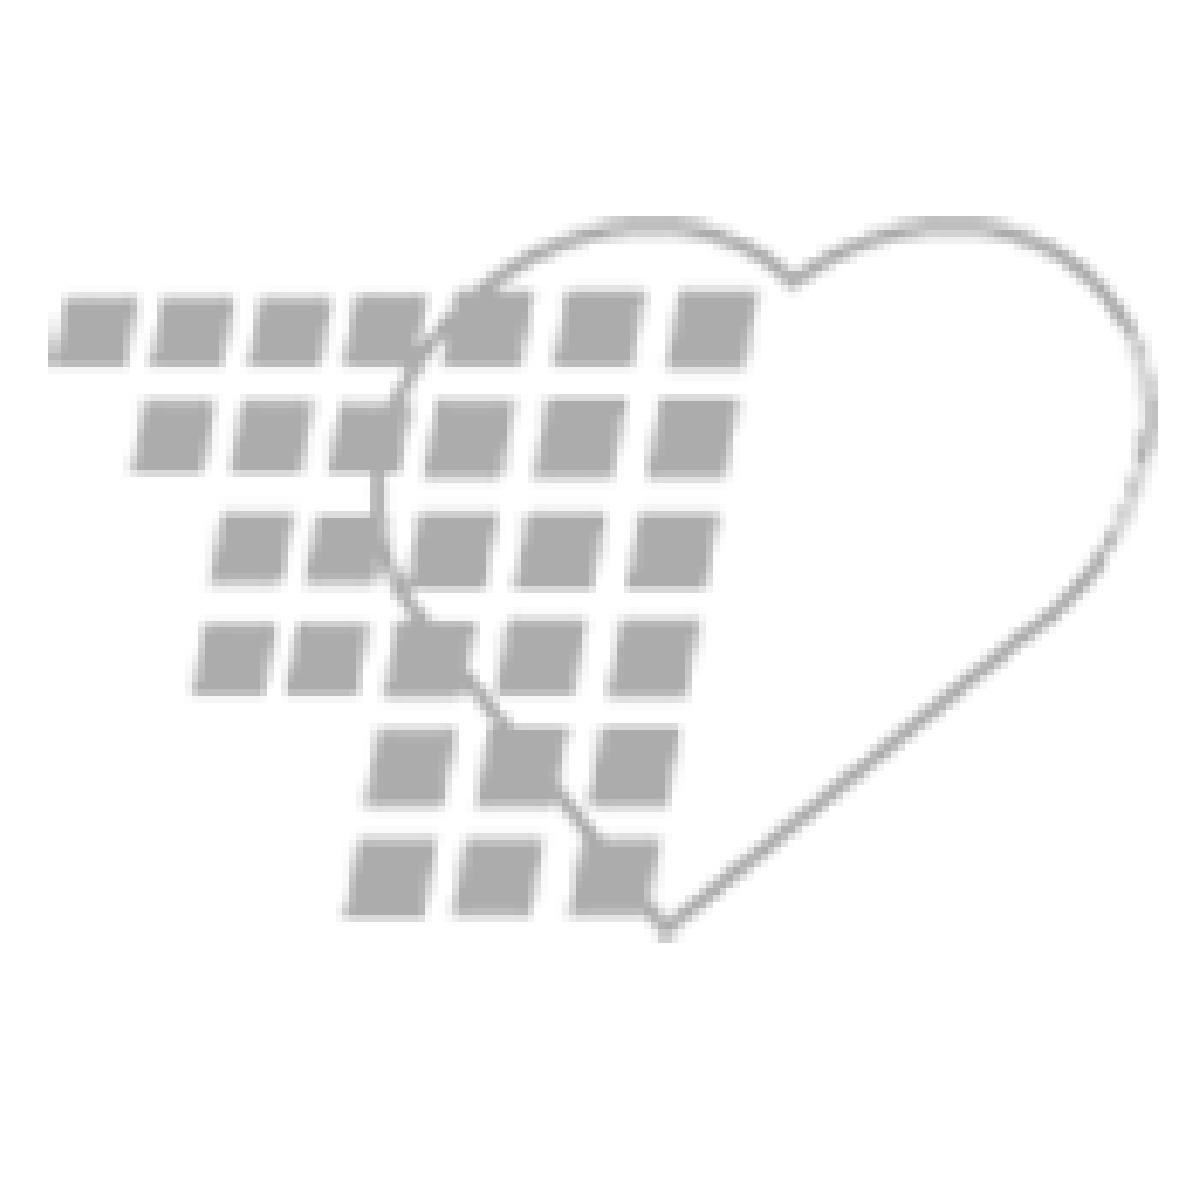 09-79-4501 - Gaumard CD Perinatal Monitors Simulation Software with Scenario Builder Non-Returnable